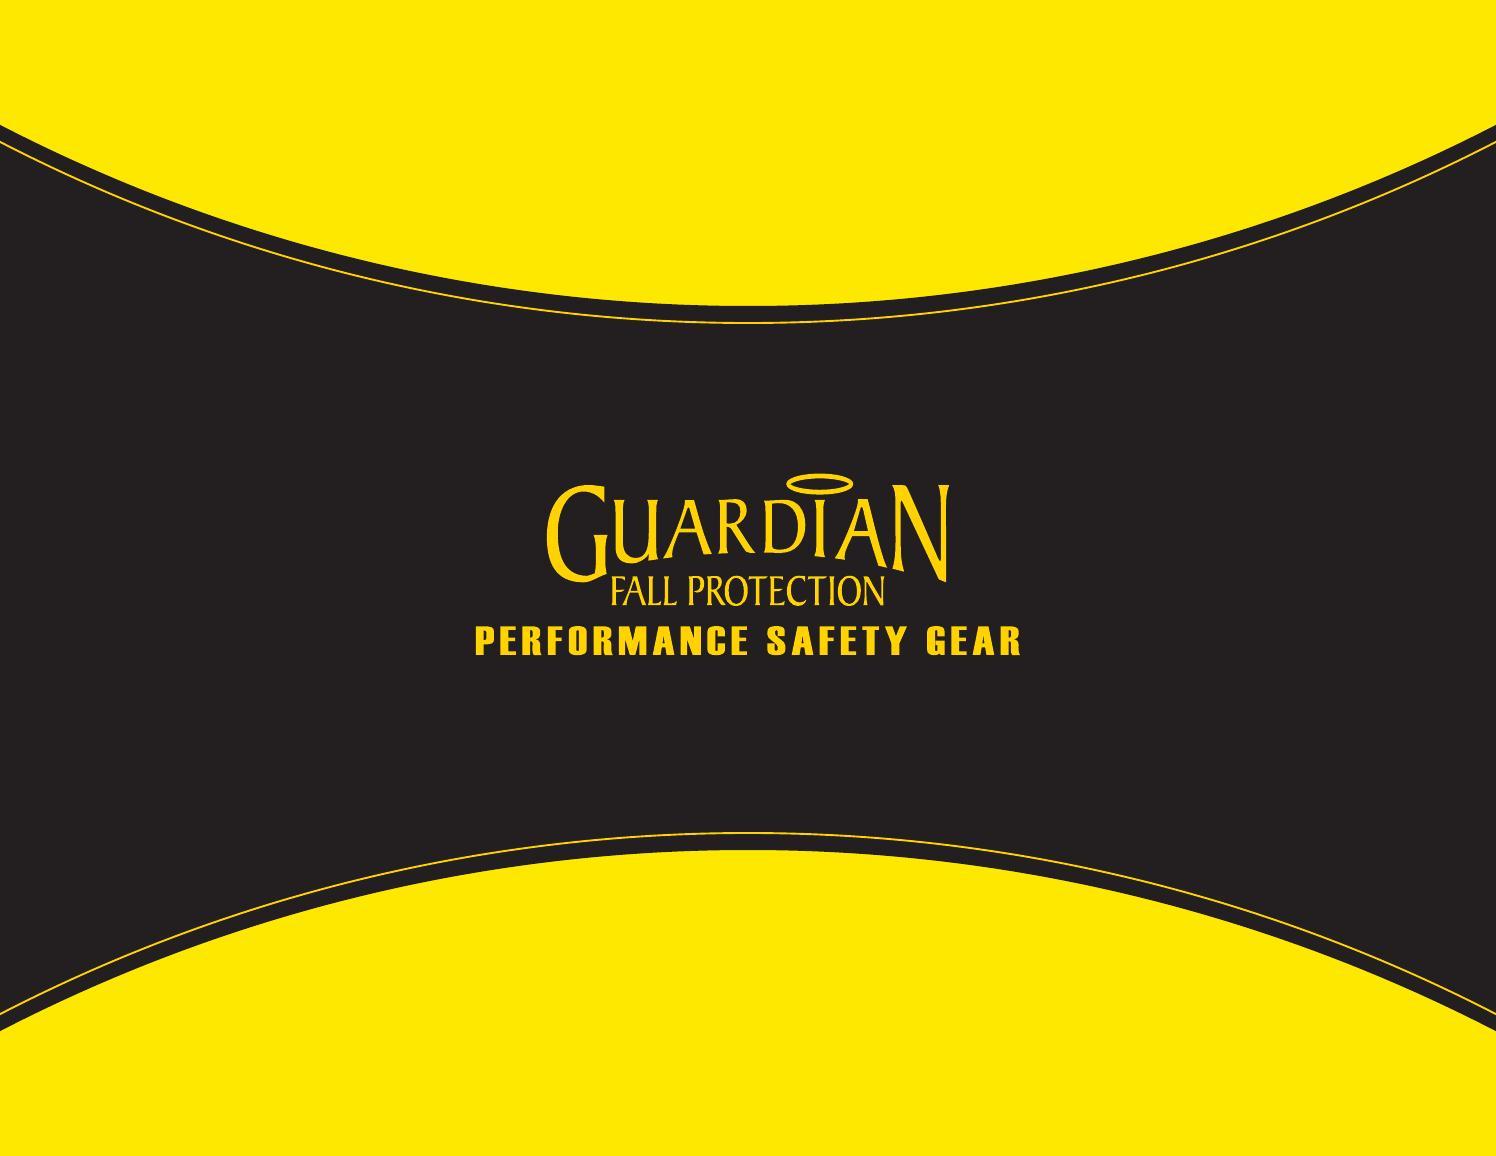 Guardian Fall Protection 01270 6-Foot Double Leg Non-Shock Absorbing Lanyard